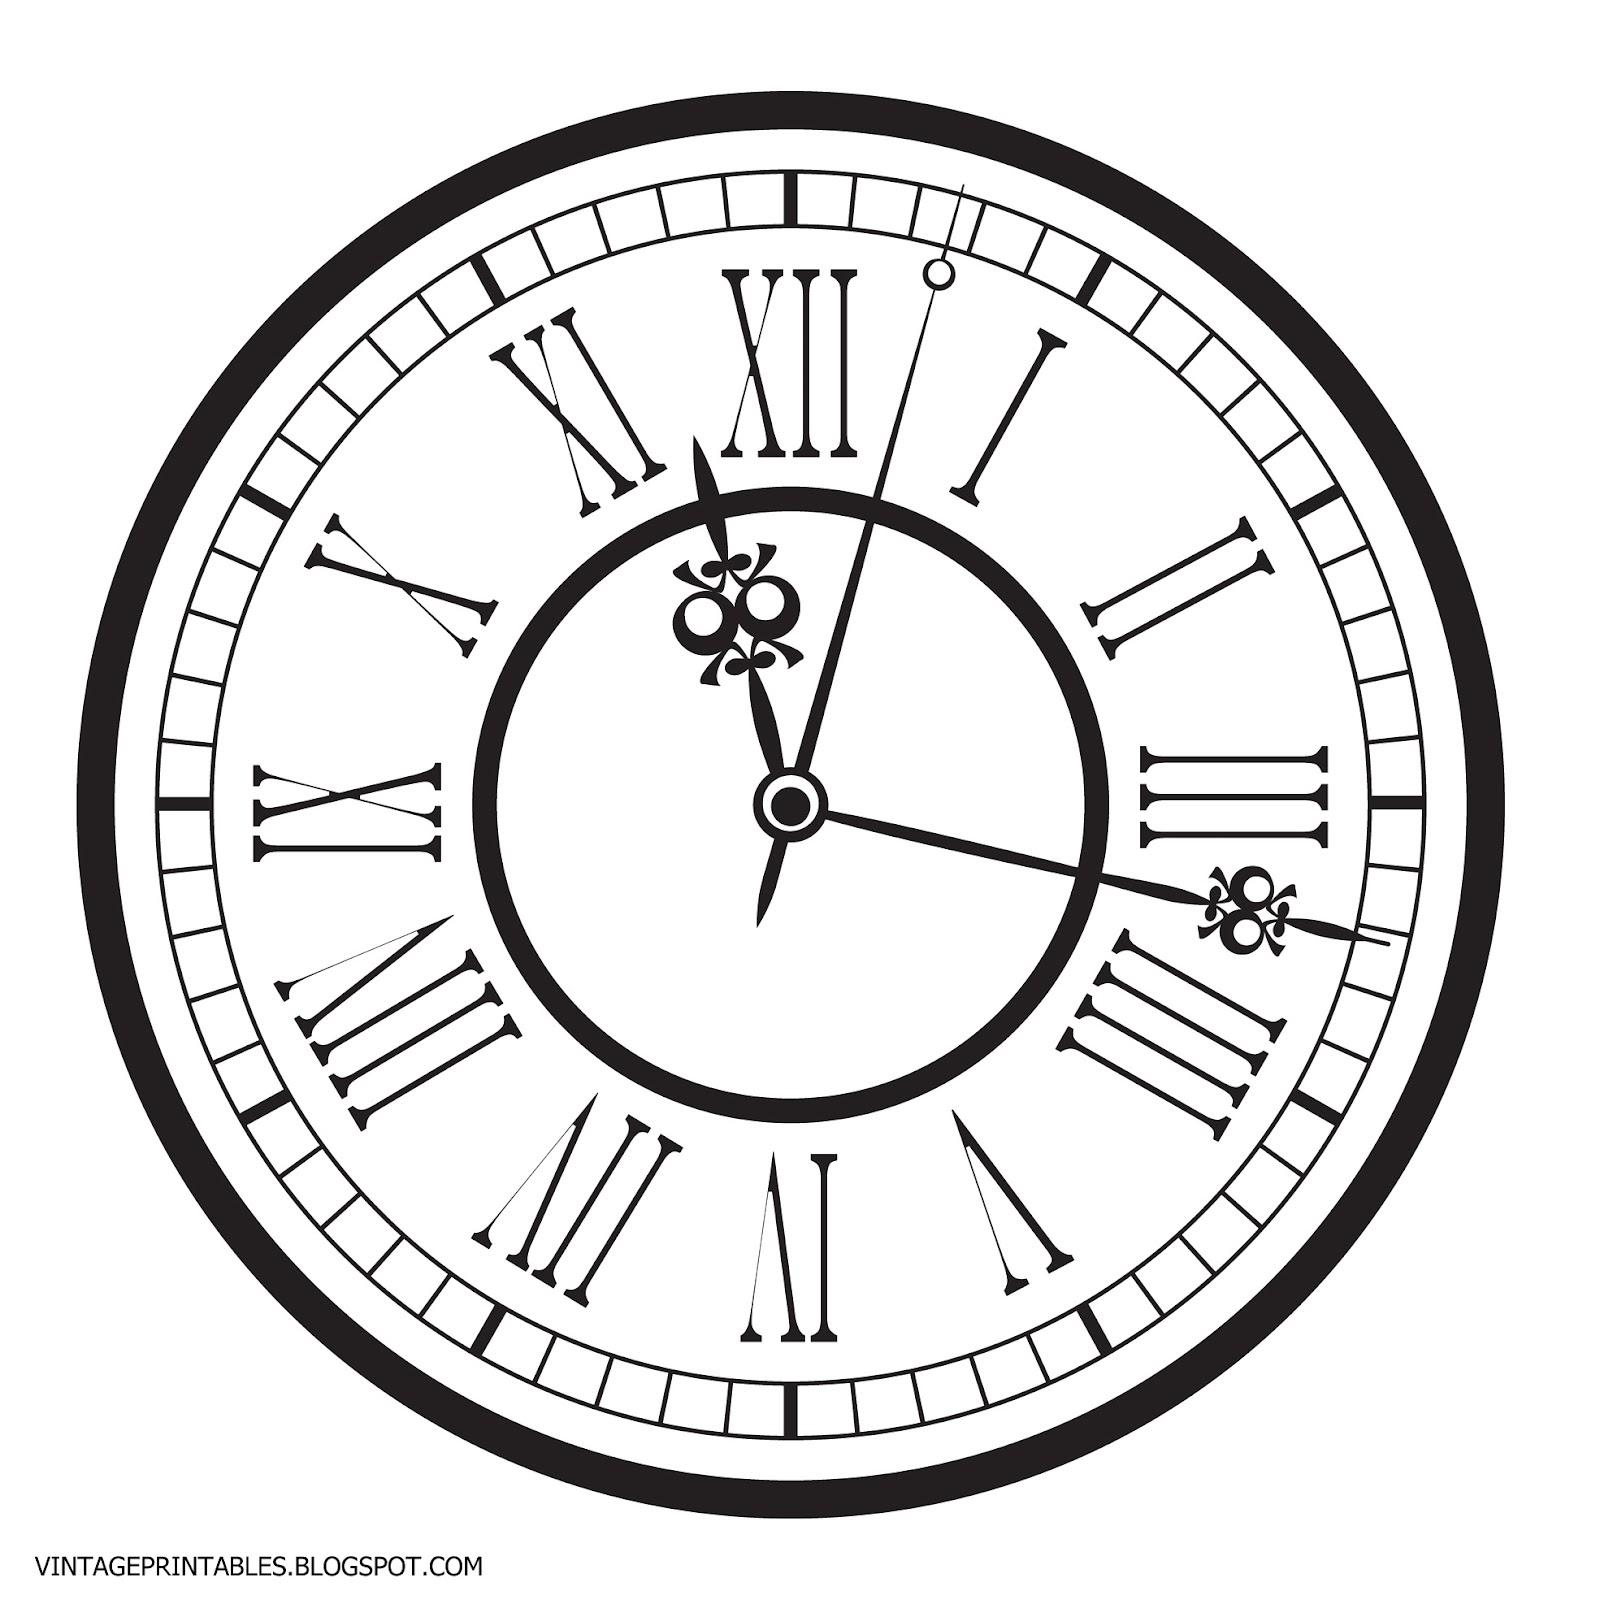 Free Vintage Clip Art Images Old Antique Clock Free Clip Art